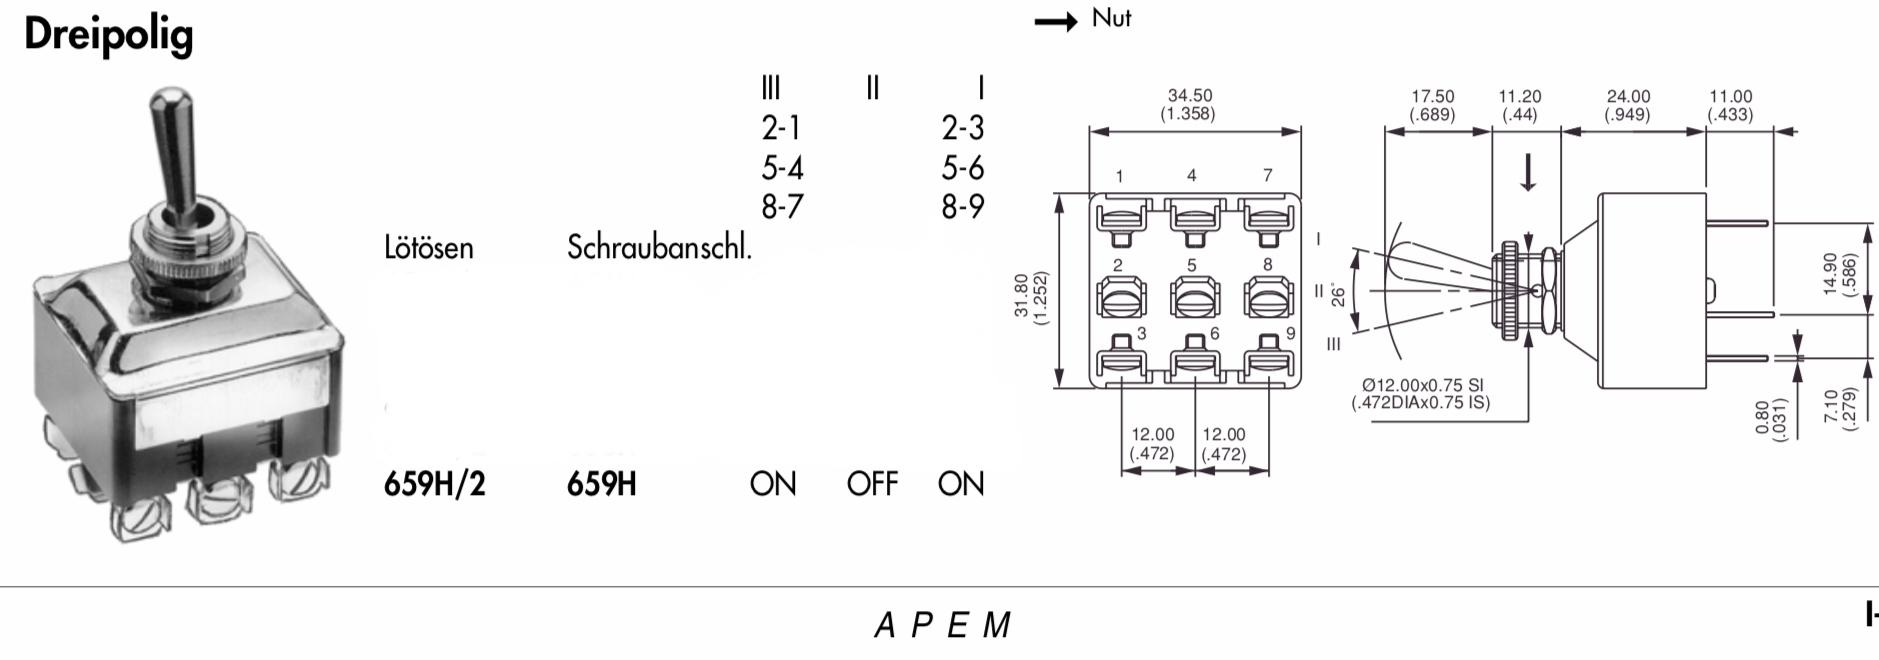 B7B7B8A5-84D4-4F1F-A99A-AD6B946E9DDC.jpeg